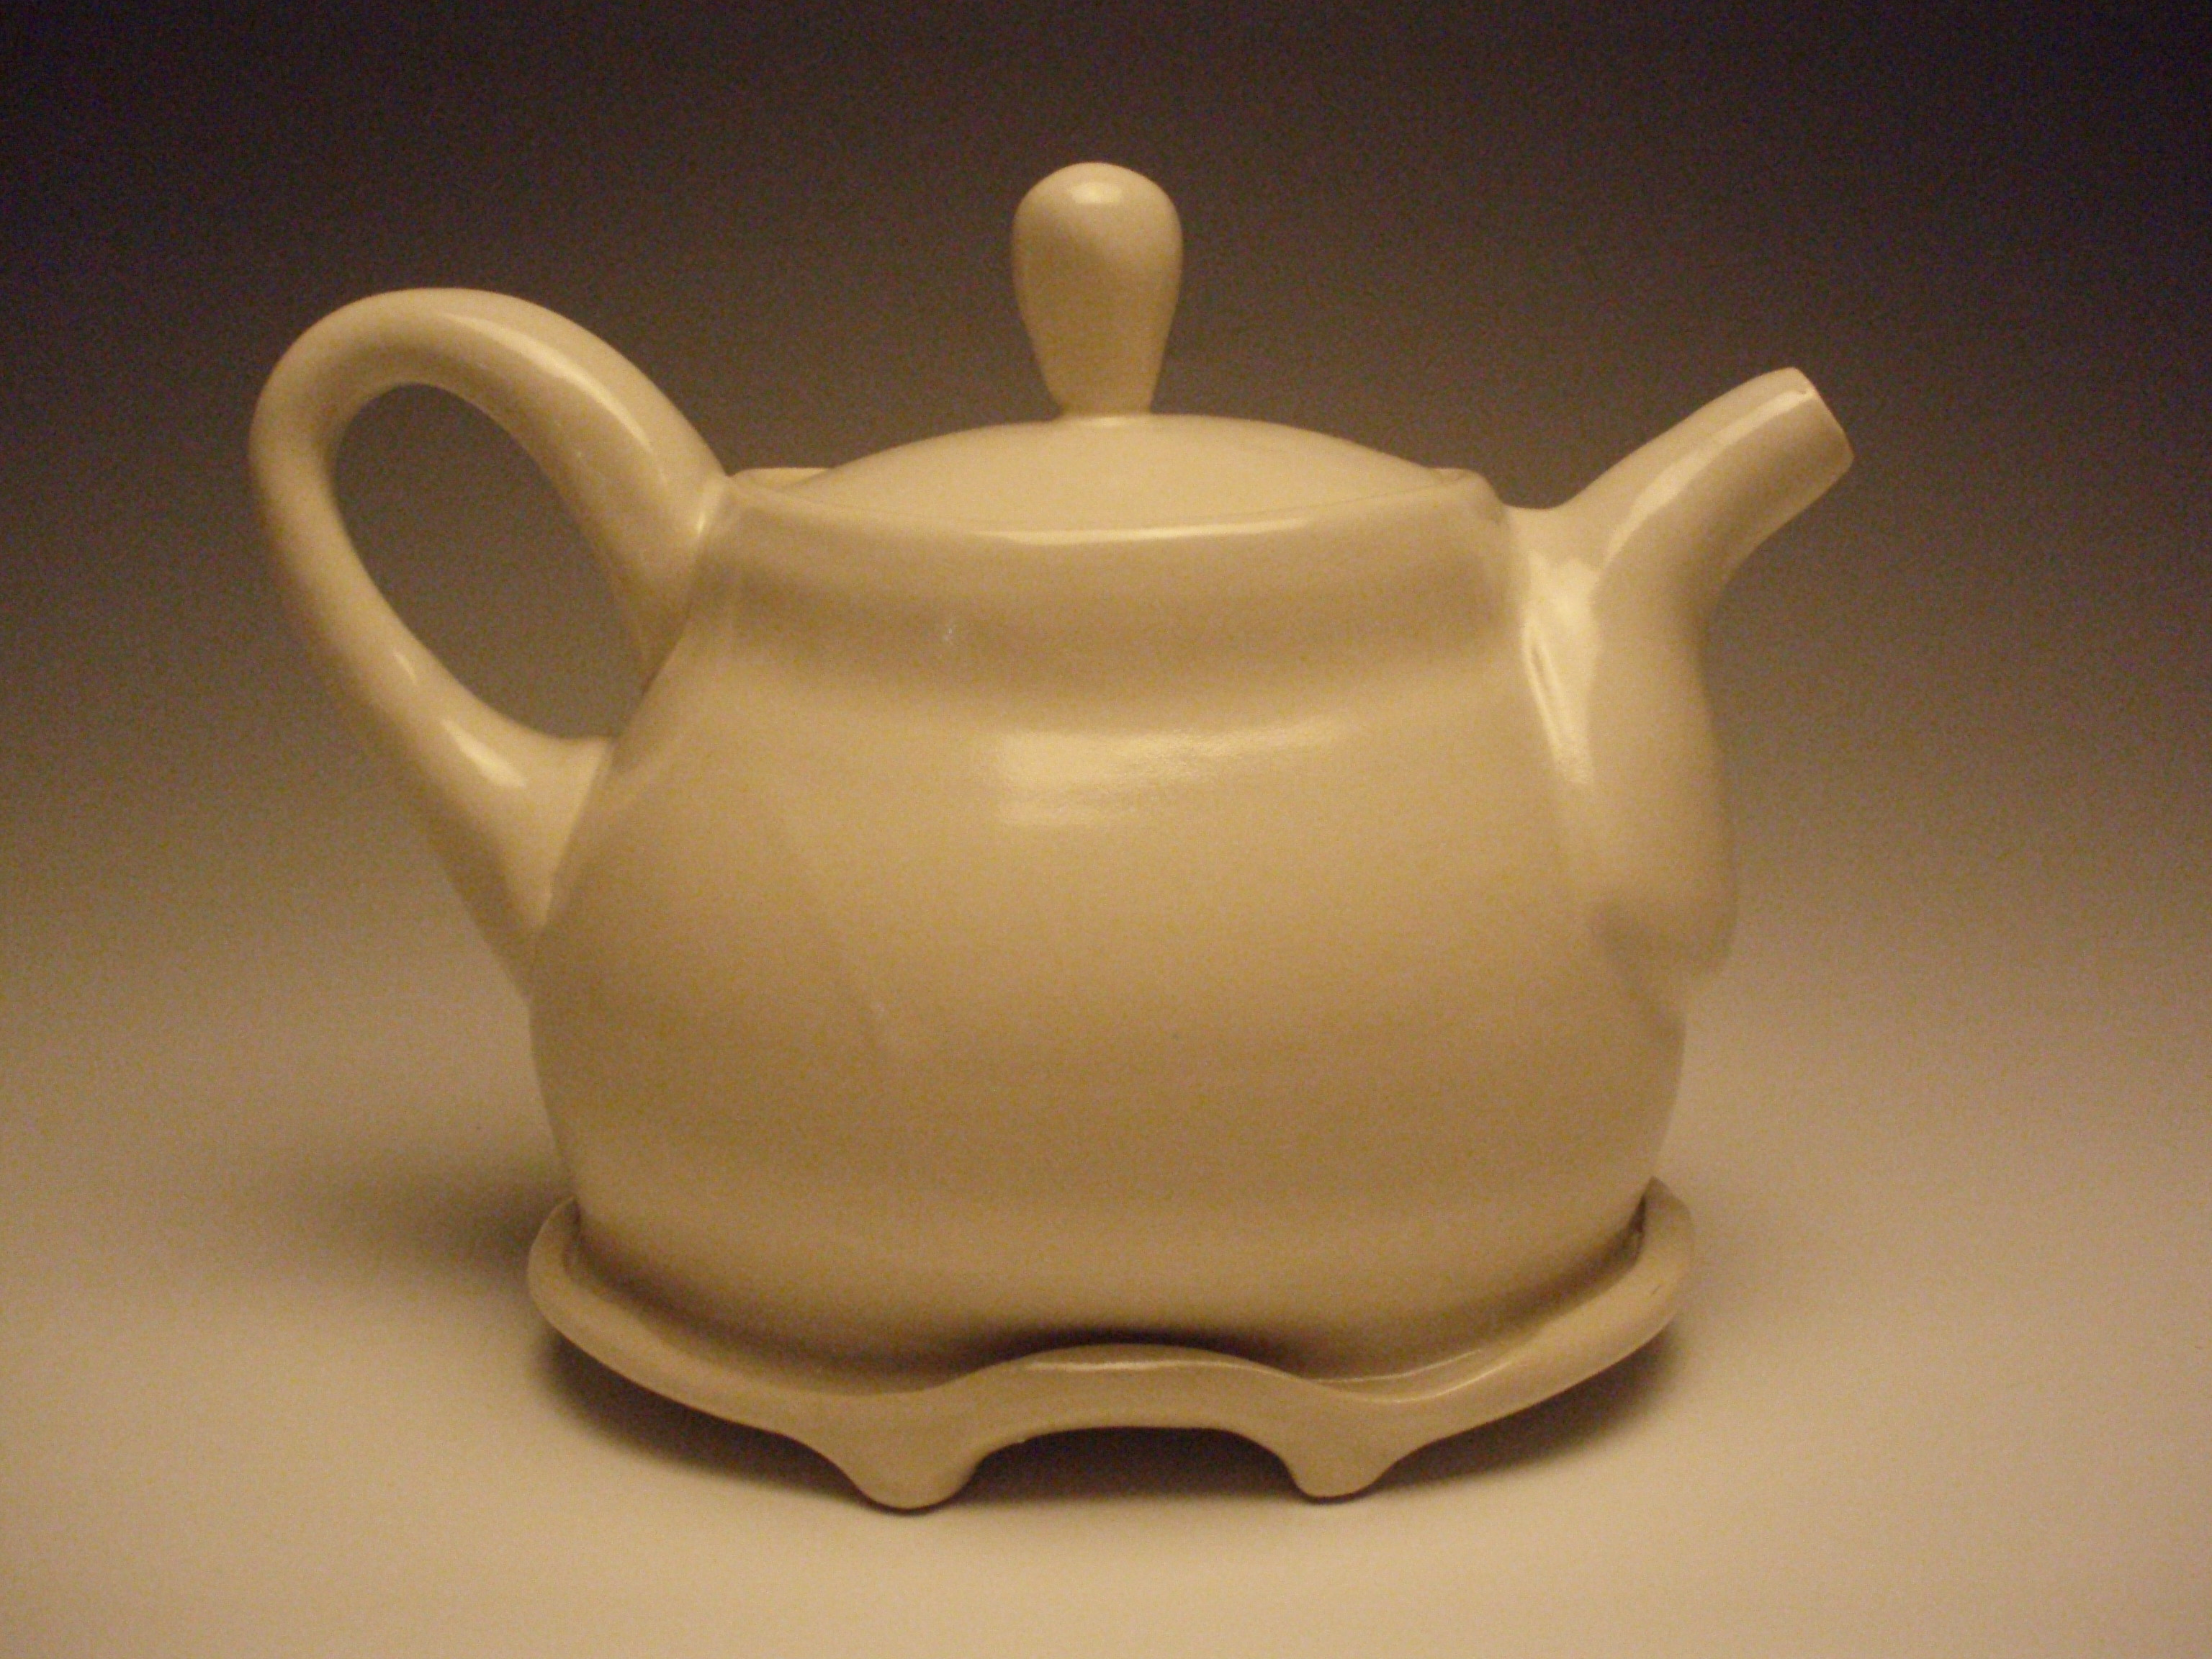 White altered teapot, 2008